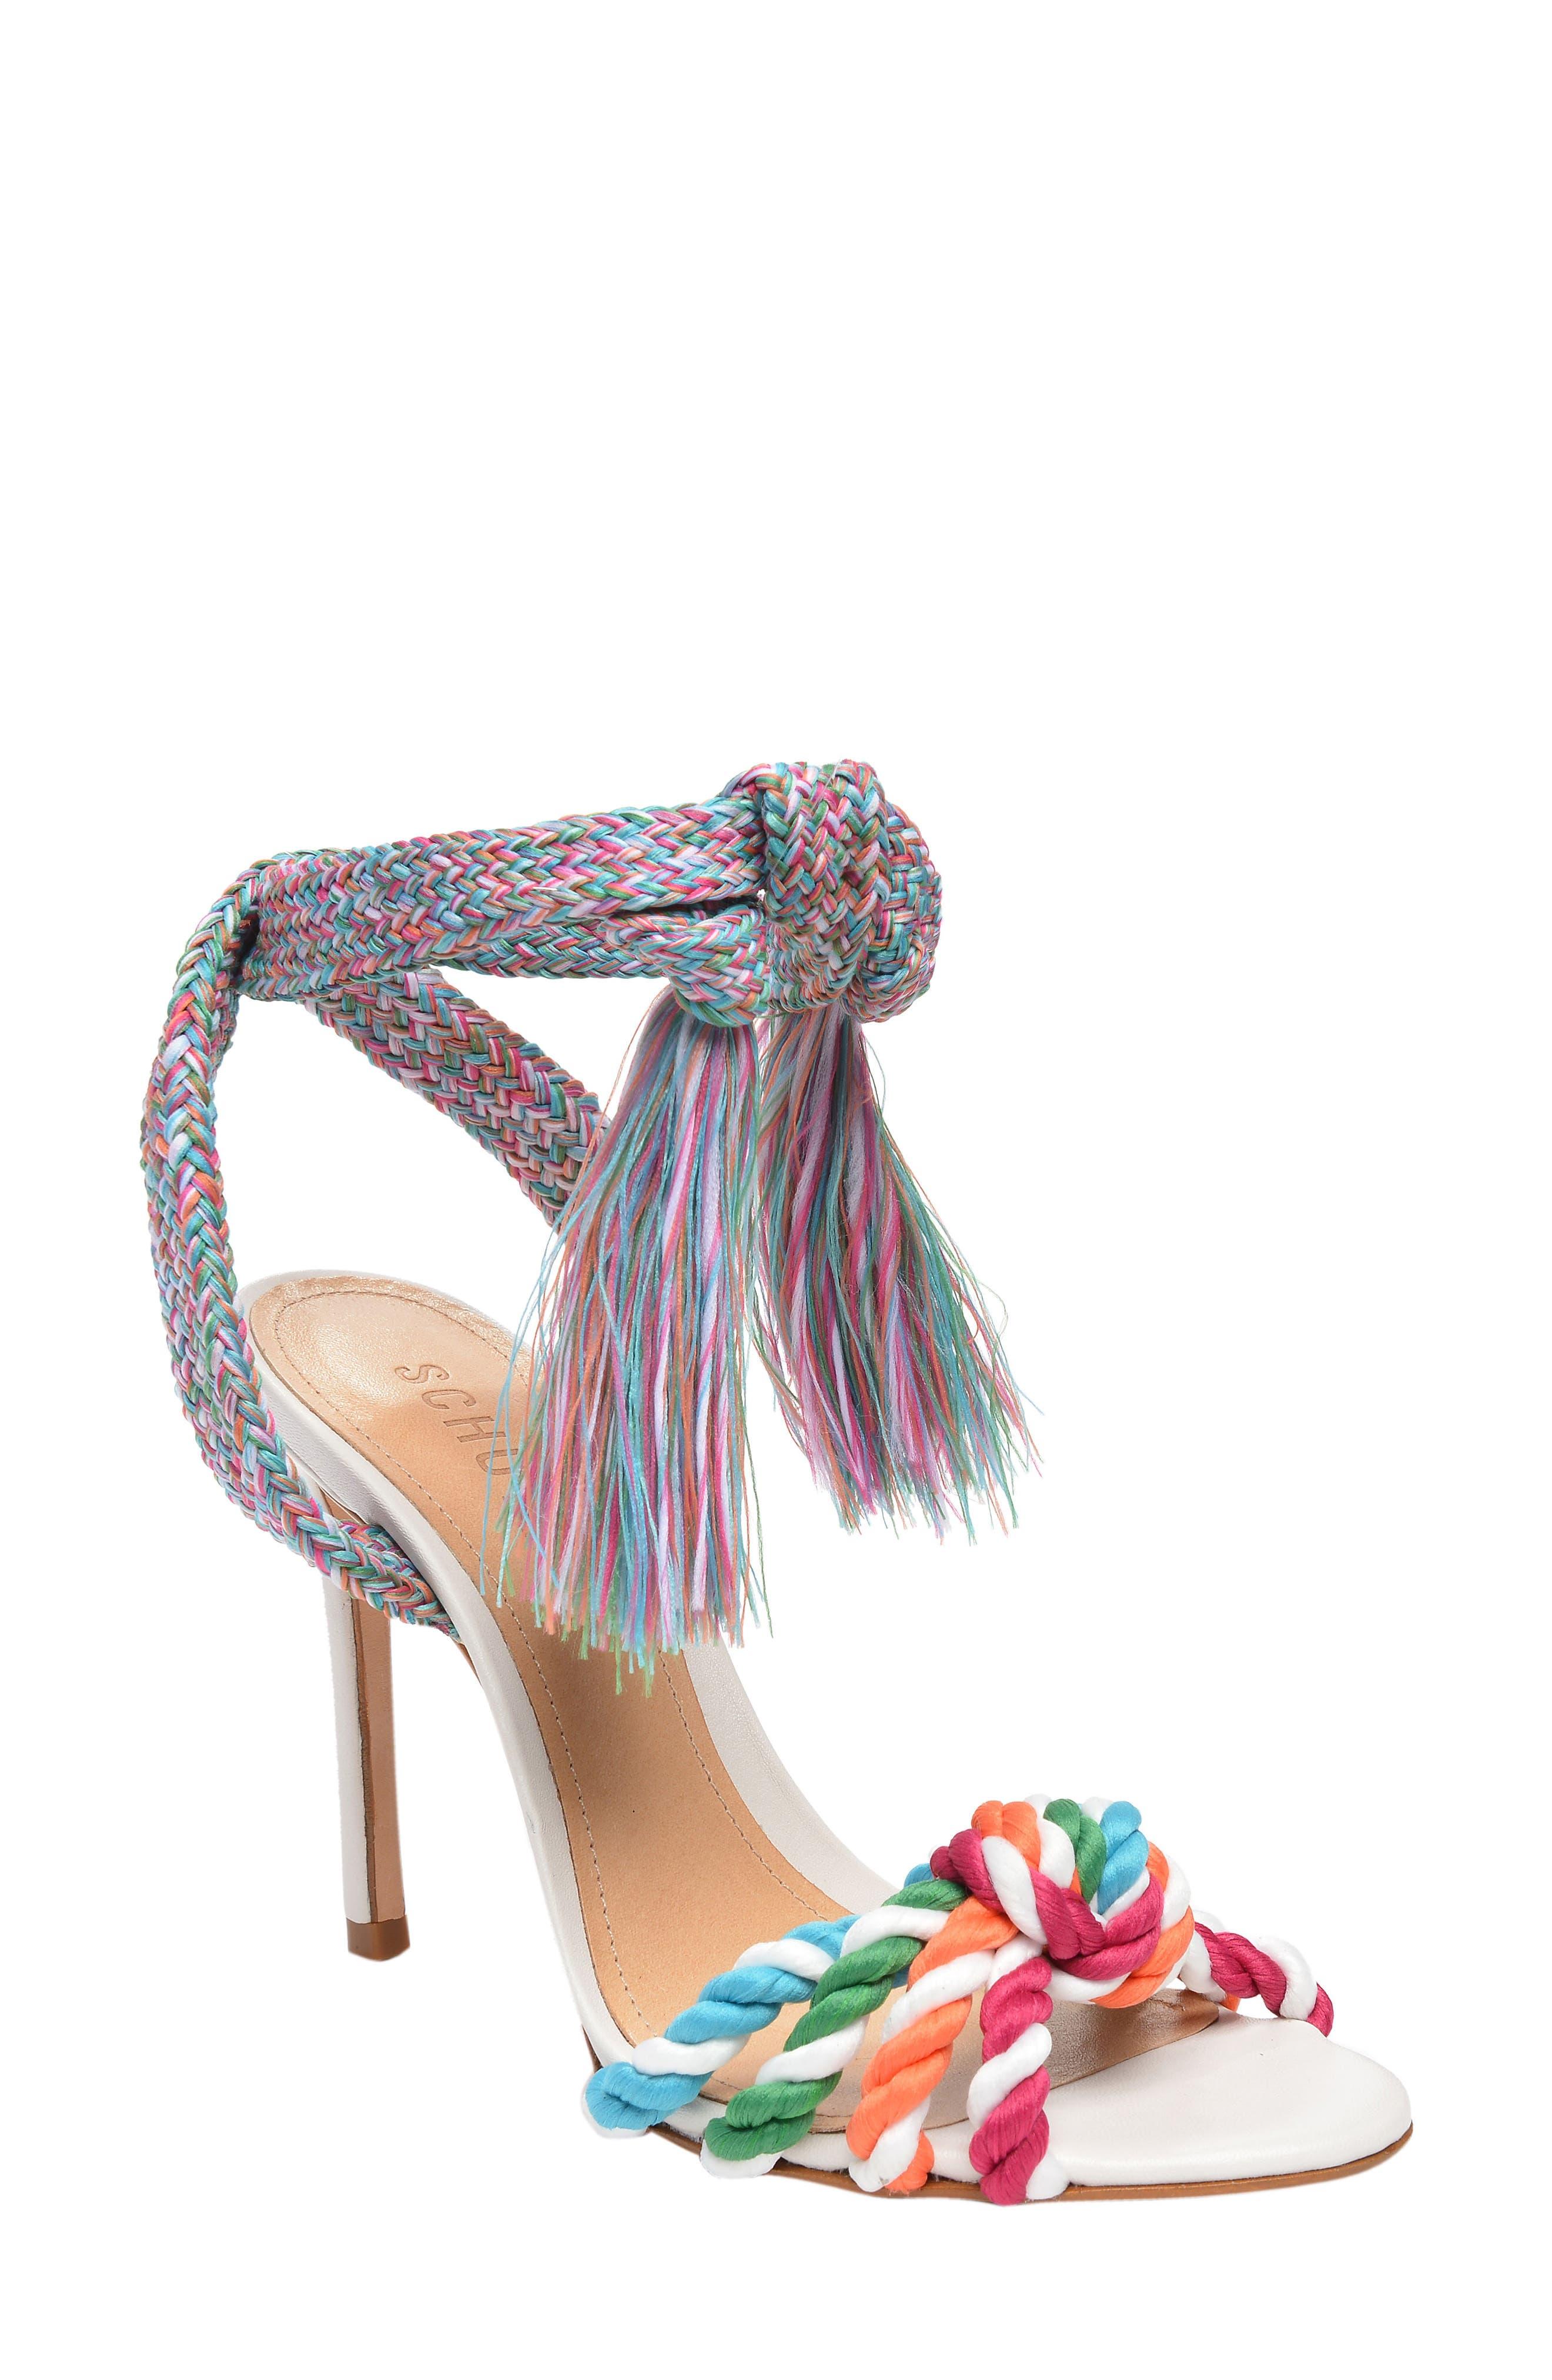 Schutz x Adriana Lima Luces Sandal (Women)